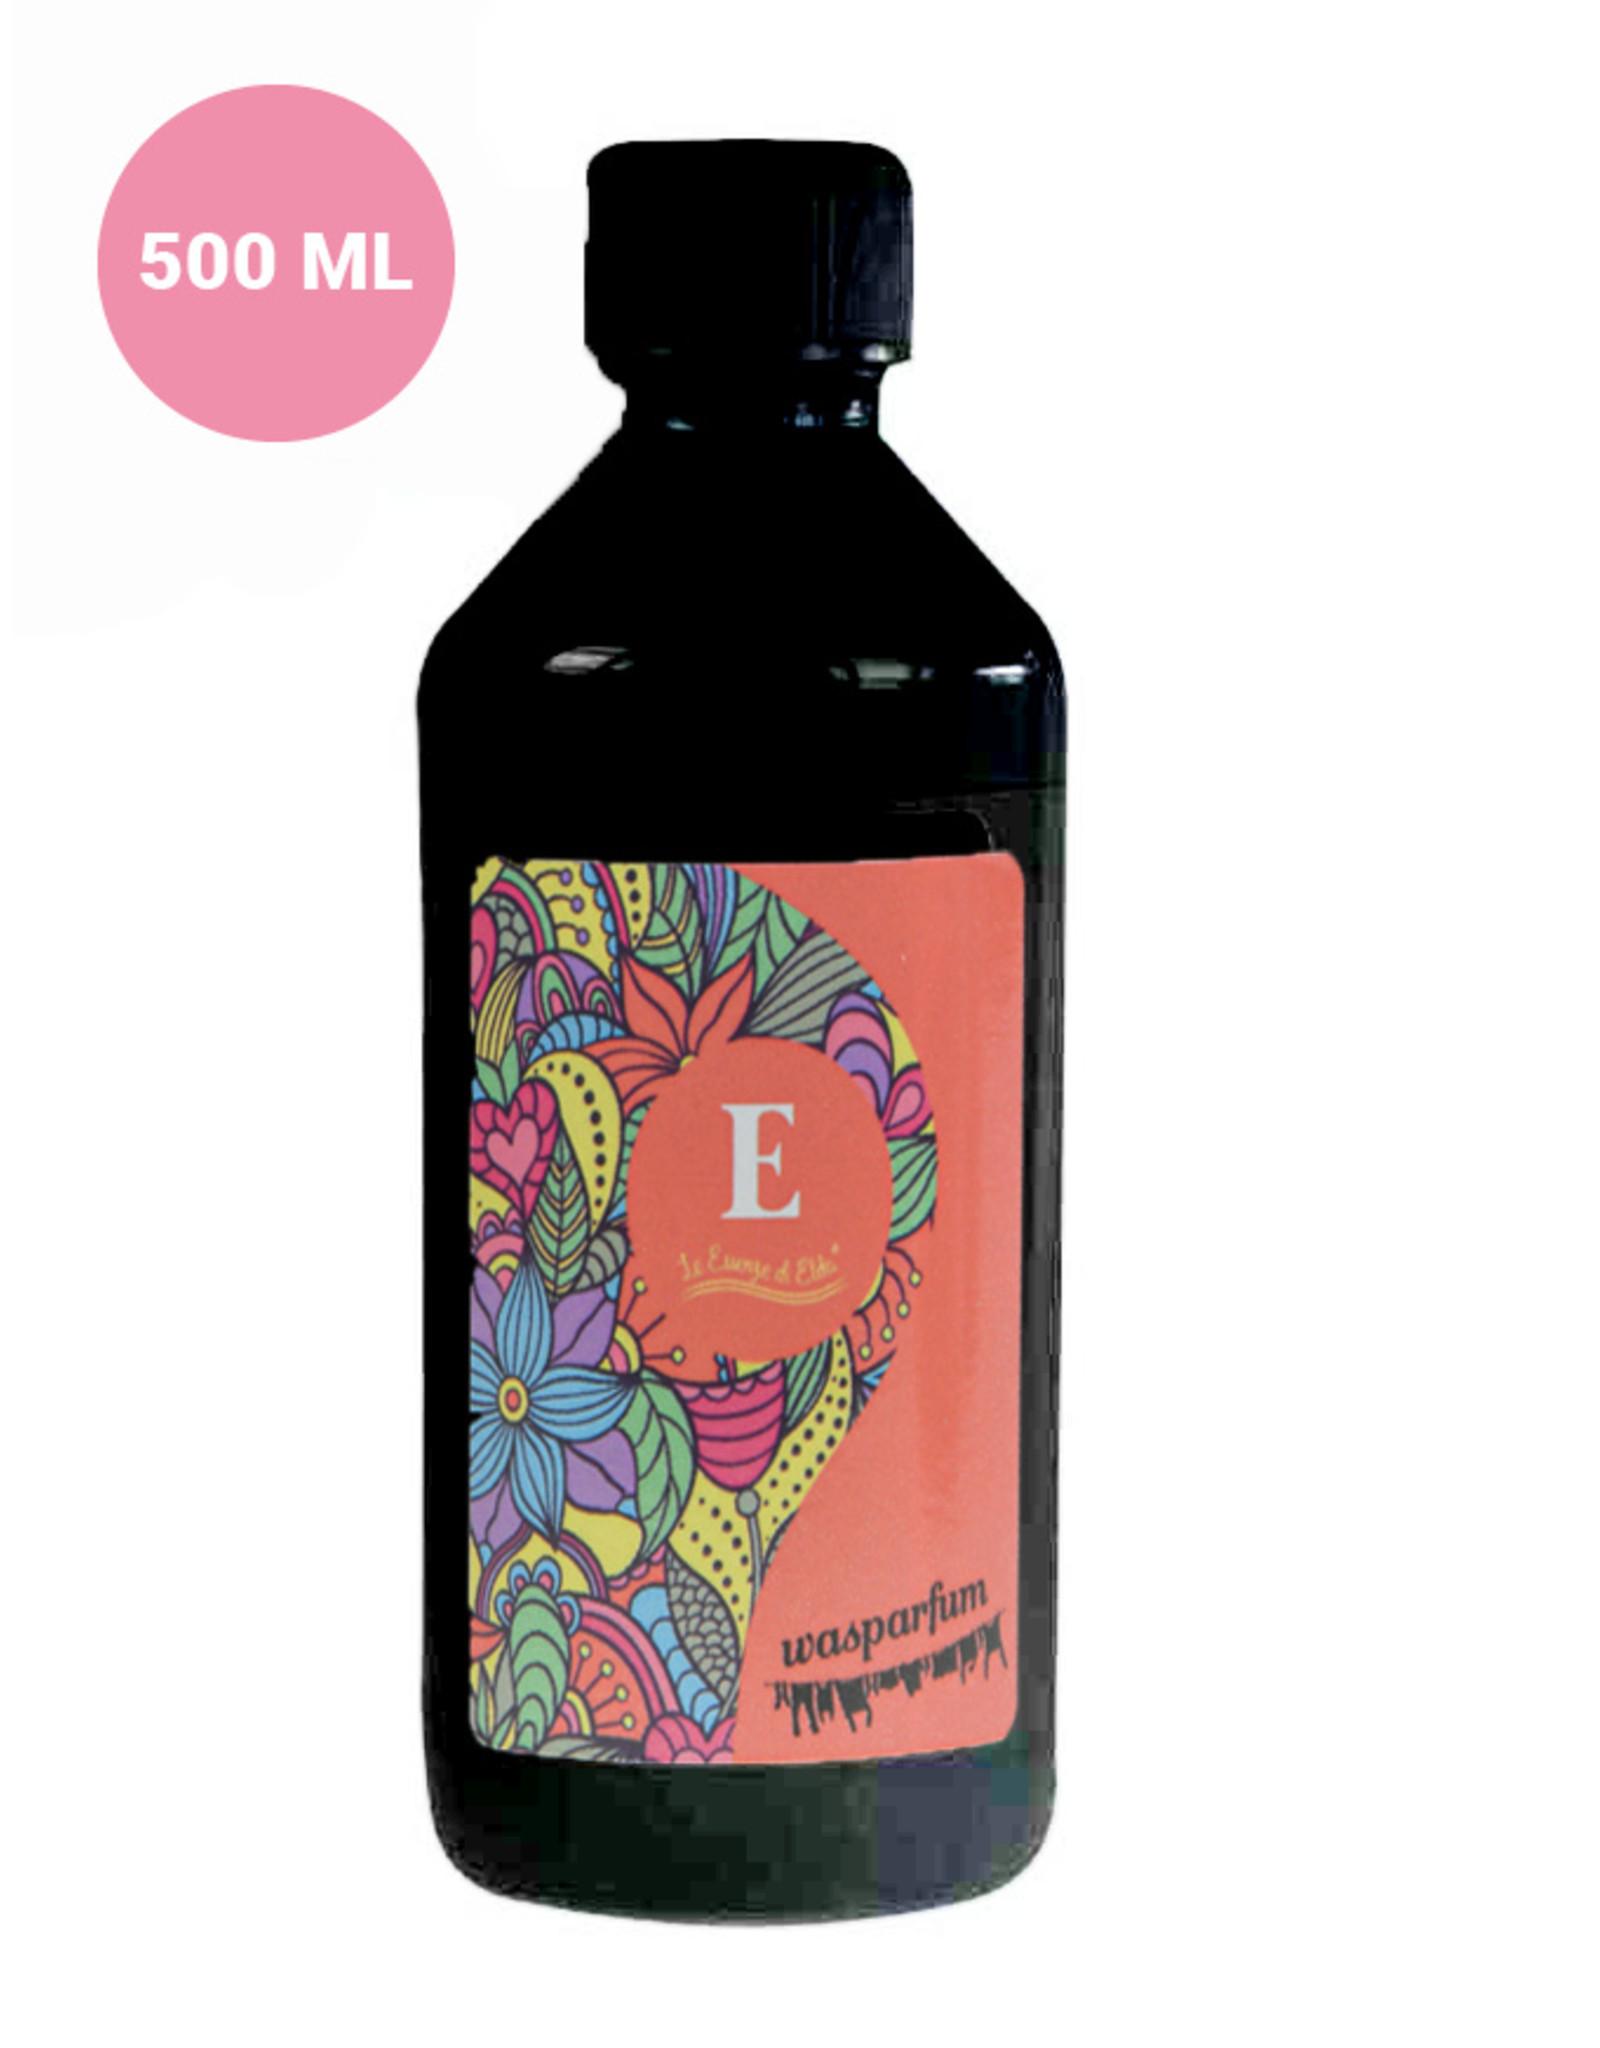 Le Essenza di Elda Wasparfum Cranberry met Granaatappel geur